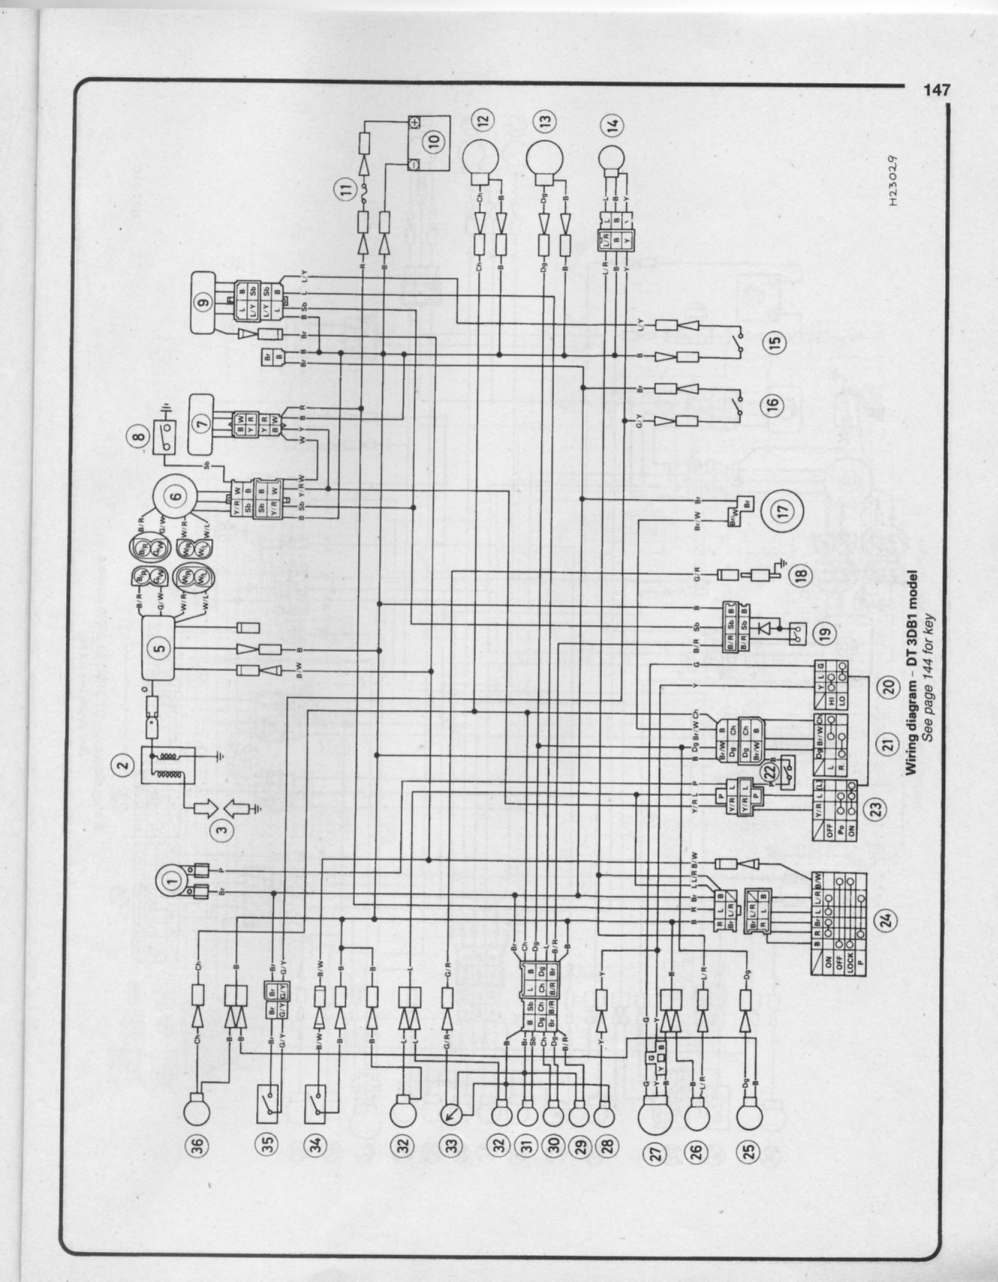 Yamaha 250 Carb Parts Wiring Diagrams likewise Johnson 9 9 carb Fuel pump furthermore Yamaha likewise 162764 Koblingsskjema Suzuki Fz50 together with Kawasaki Klx 125 Carburetor Diagram. on yamaha enduro wiring diagram